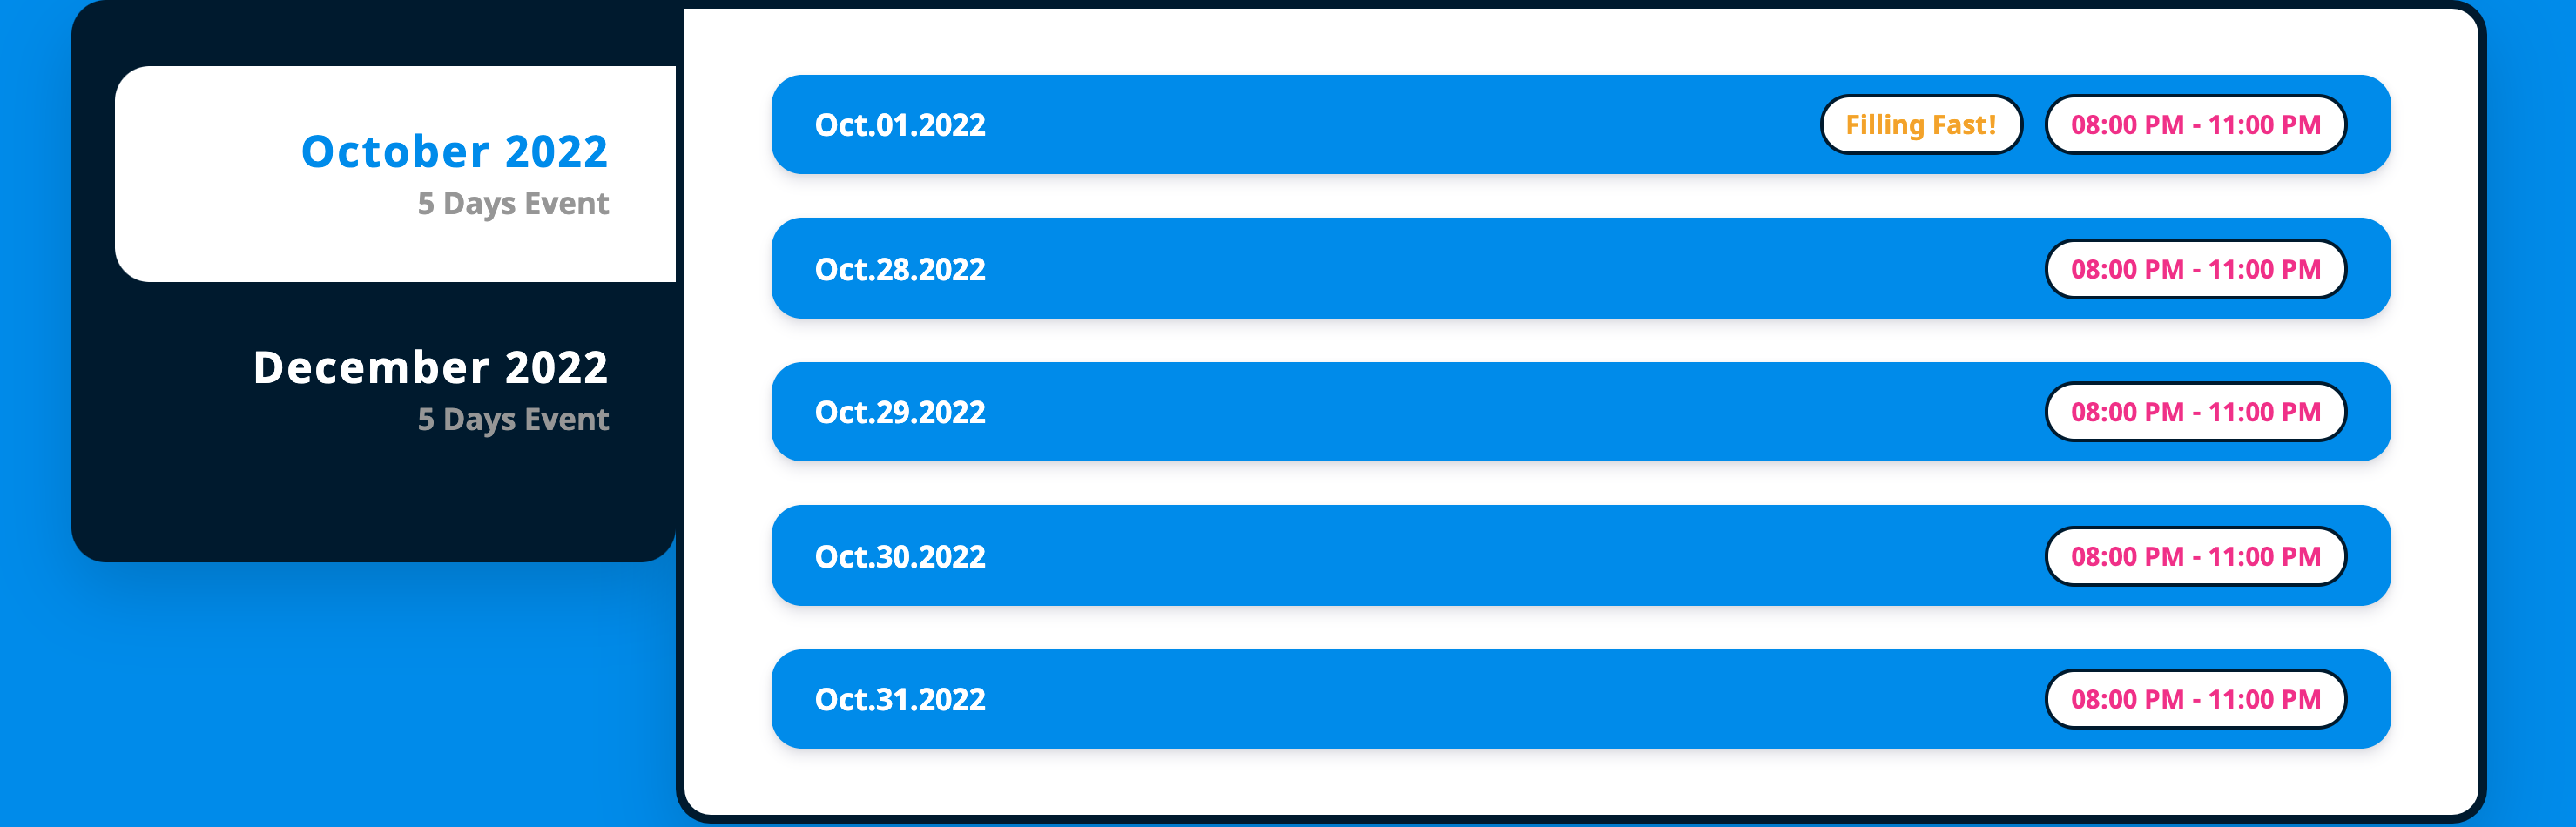 Skip repetitive schedule